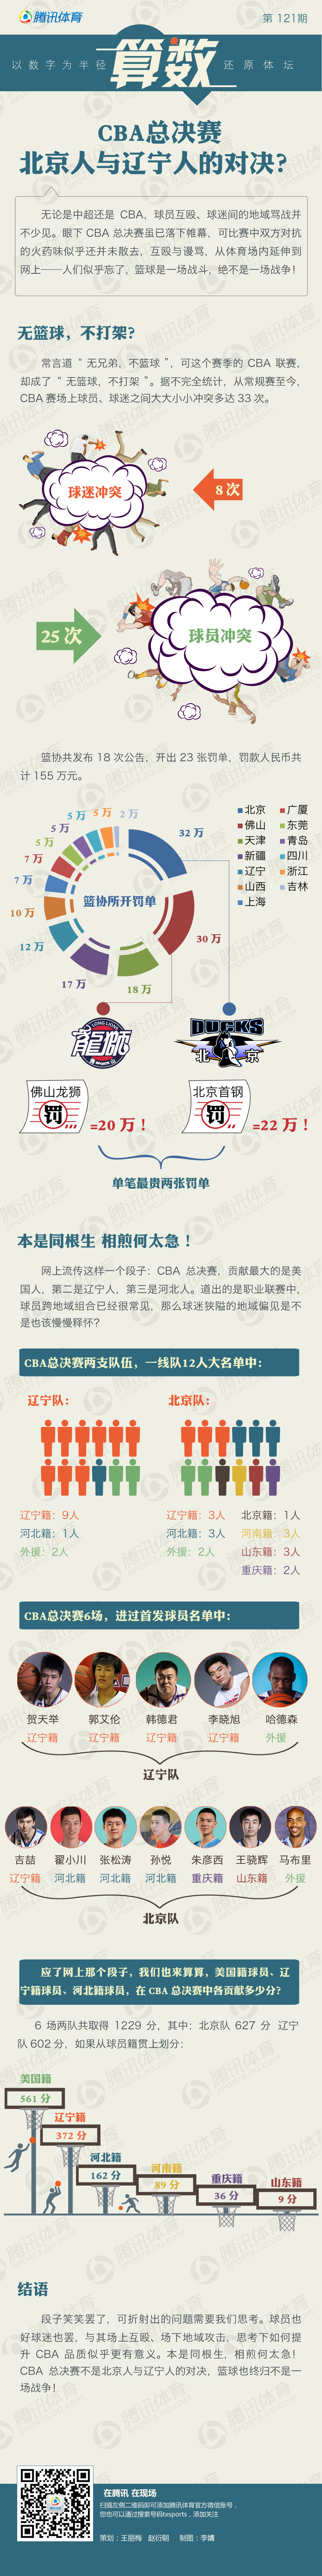 CBA总决赛 北京人与辽宁人的对决?